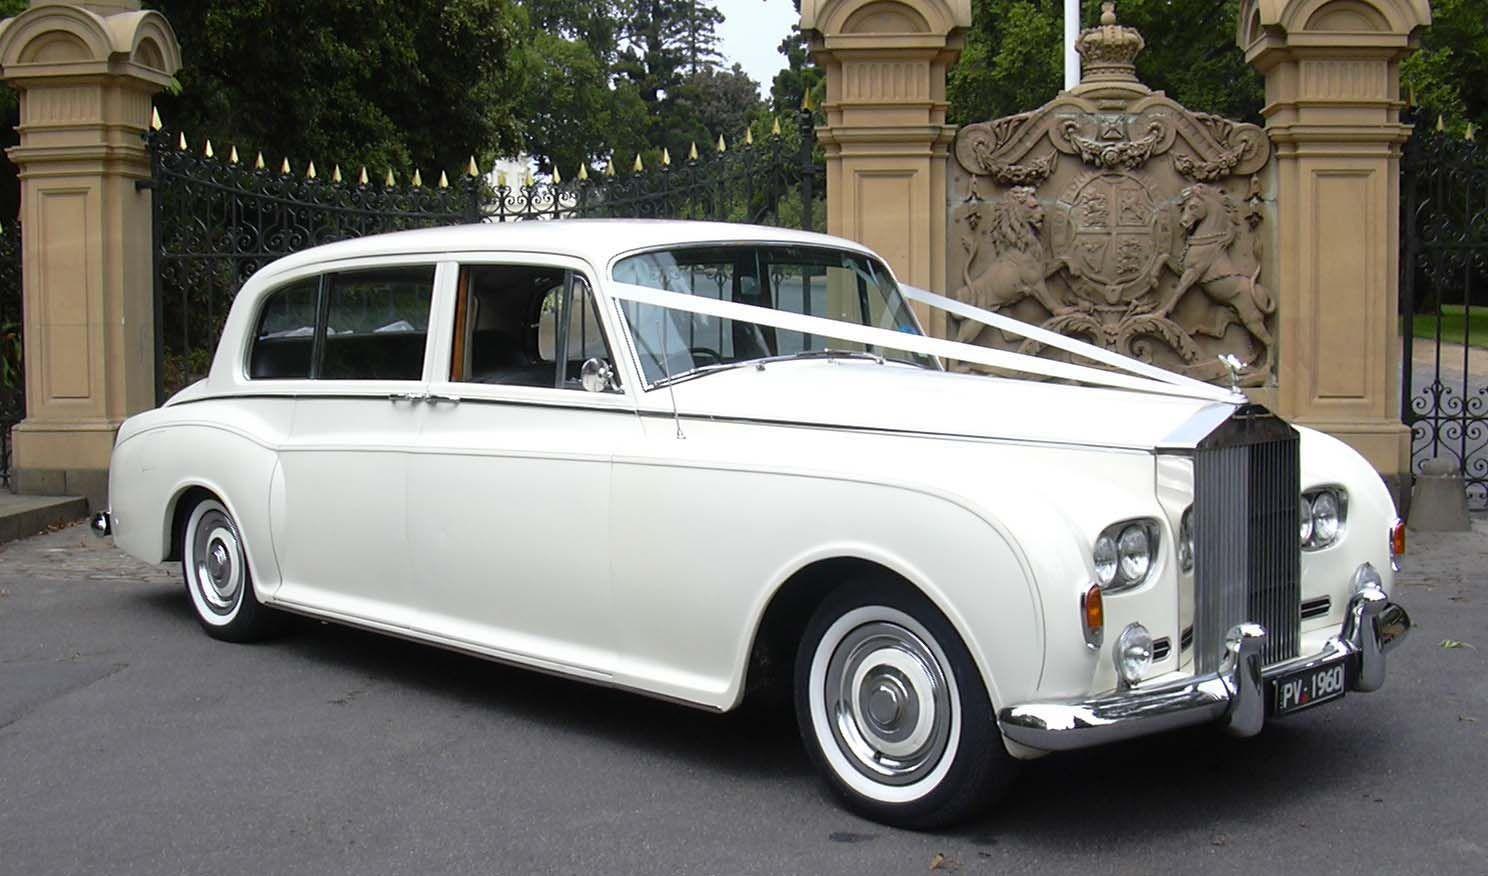 Poss Choice Of Wedding Car White Rolls Spring Wedding